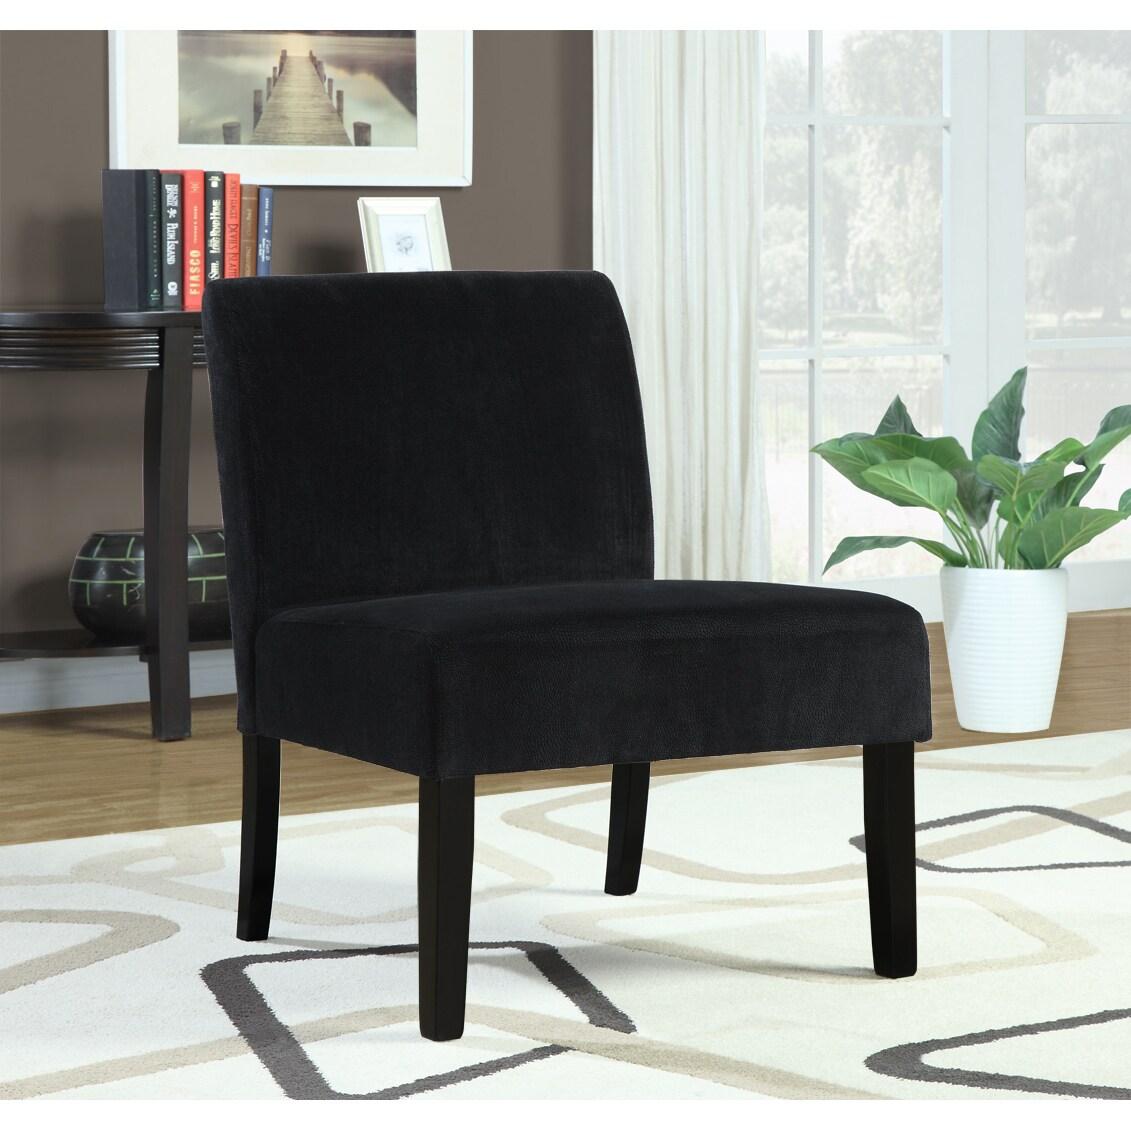 Black Crocodile Velvet Accent Chair 14349421 Overstock